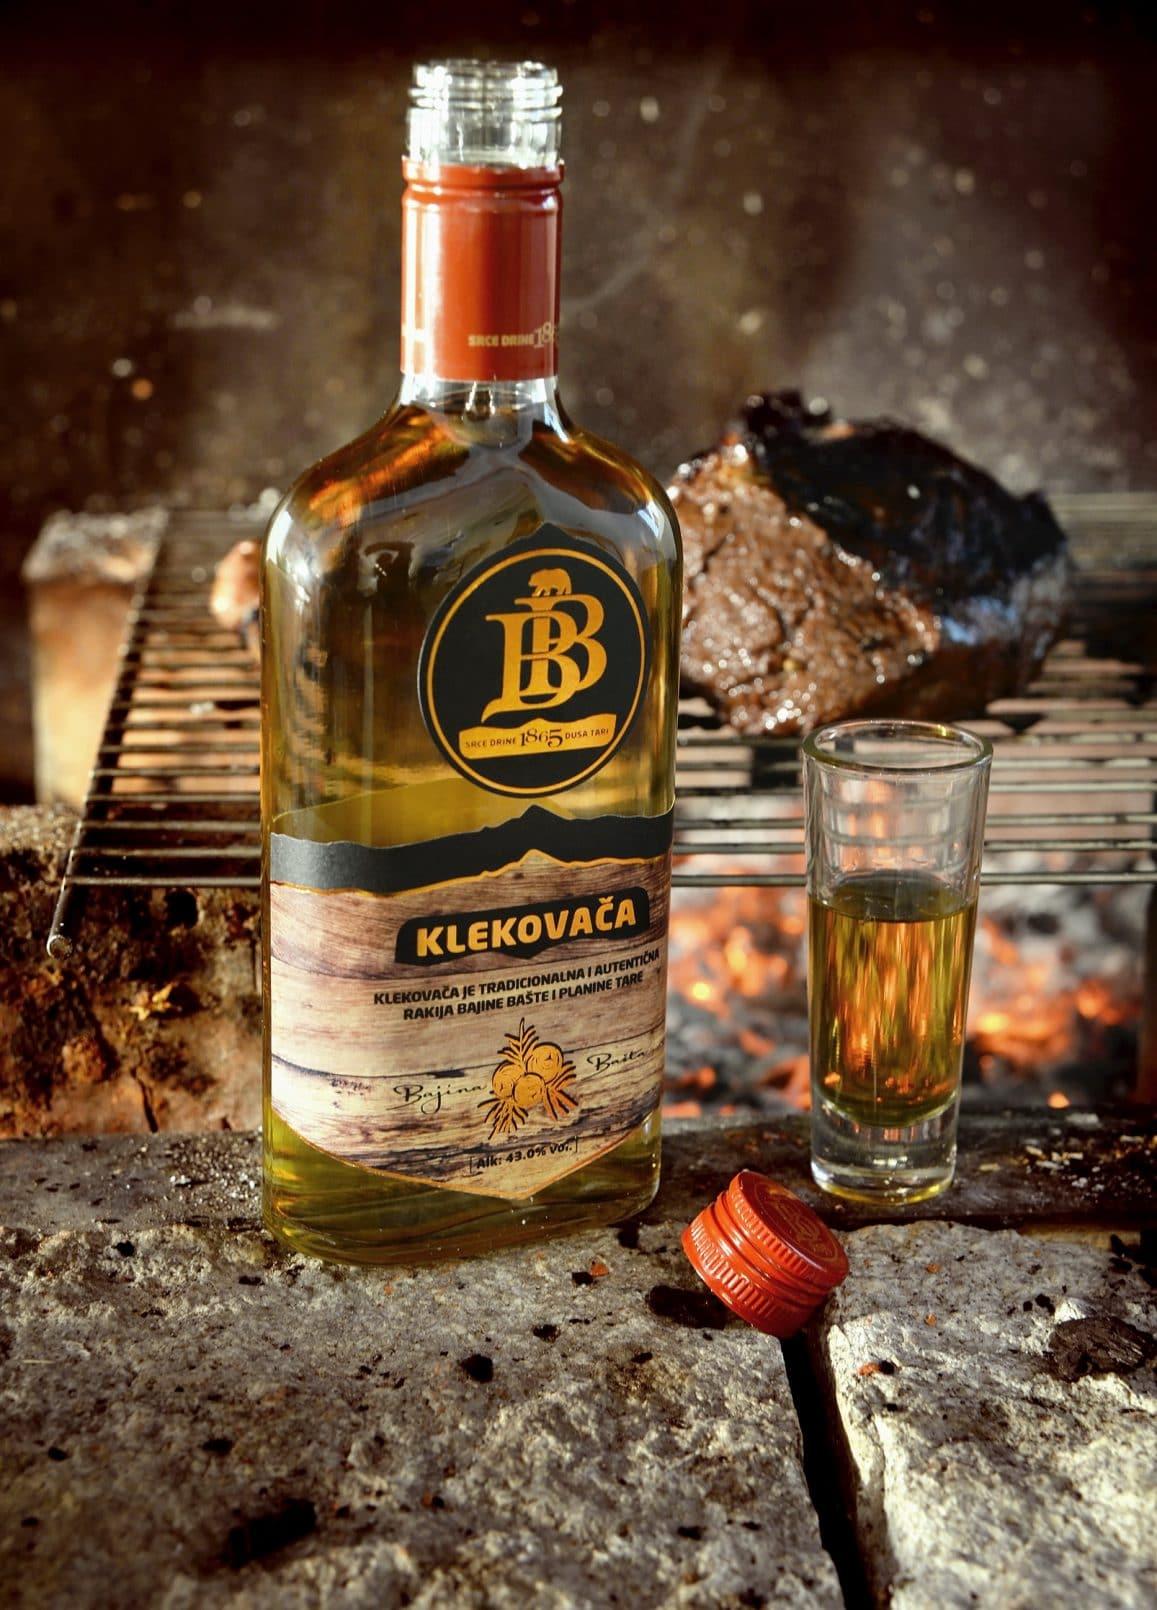 zlatibor_serbia